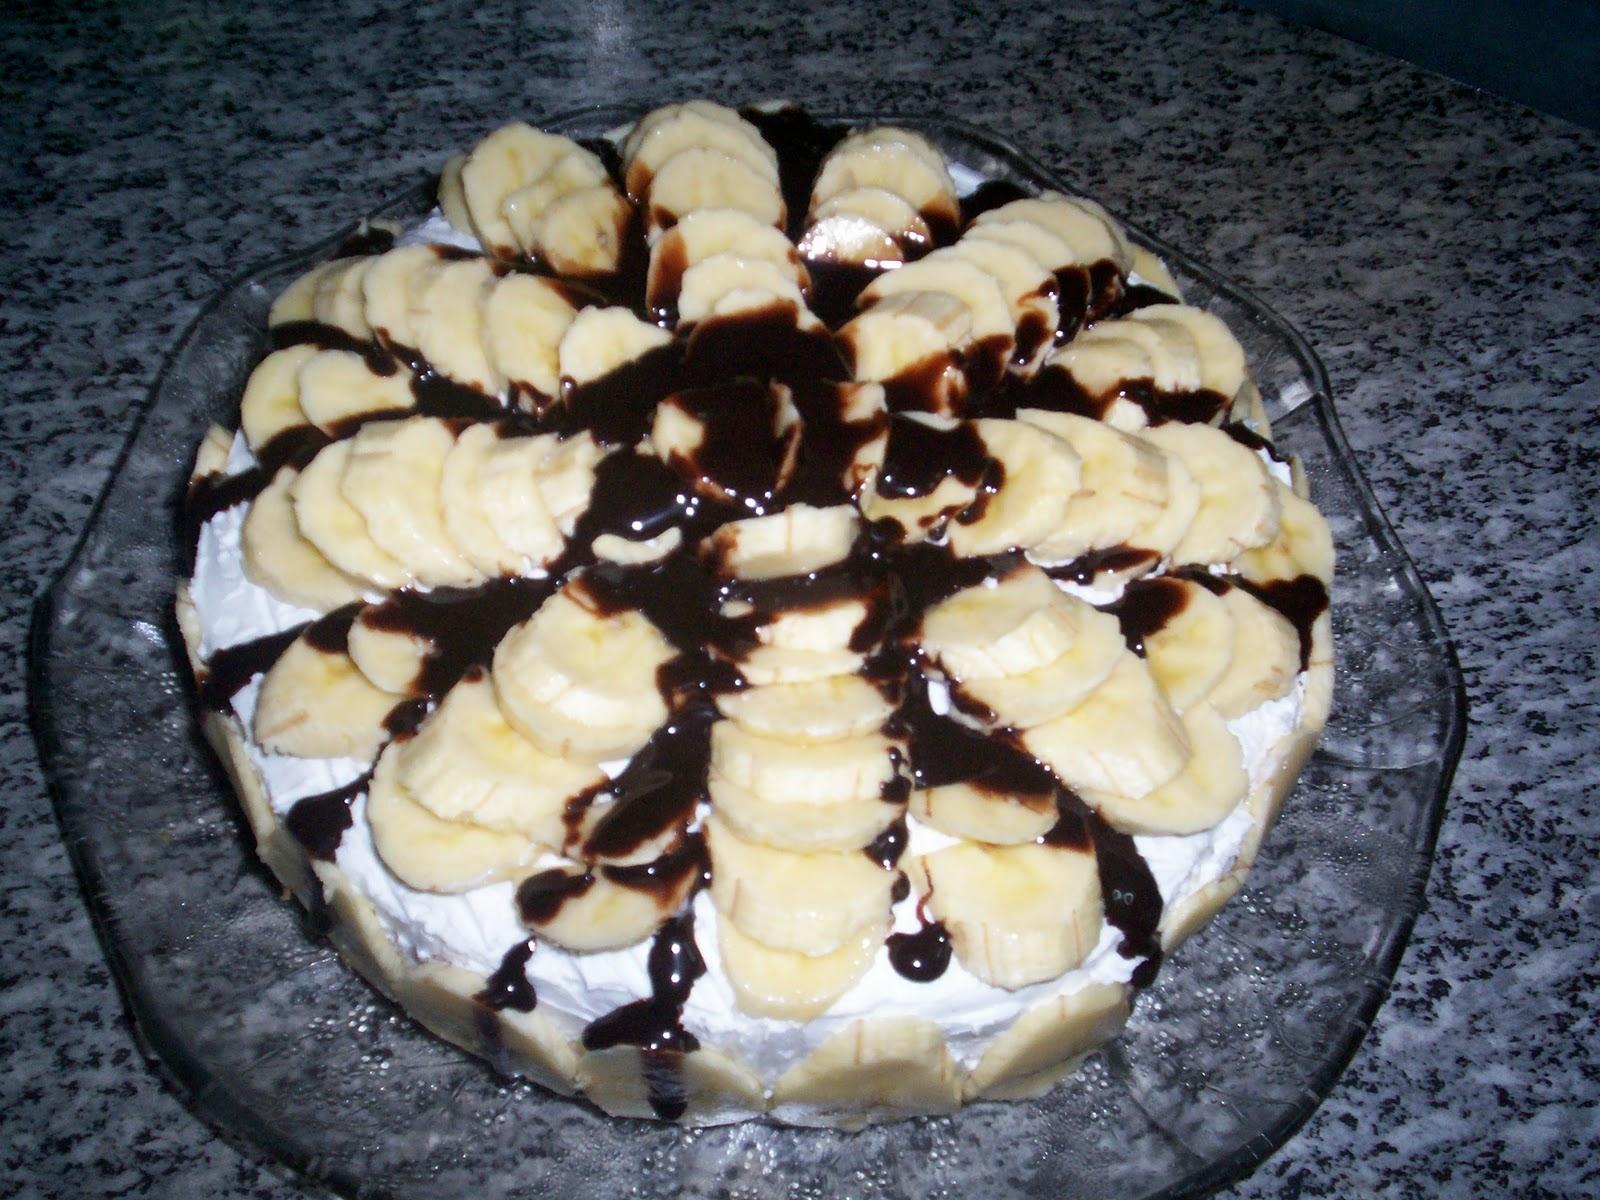 nugatlı pasta tarifi resimli middot muzlu çikolatalı pasta